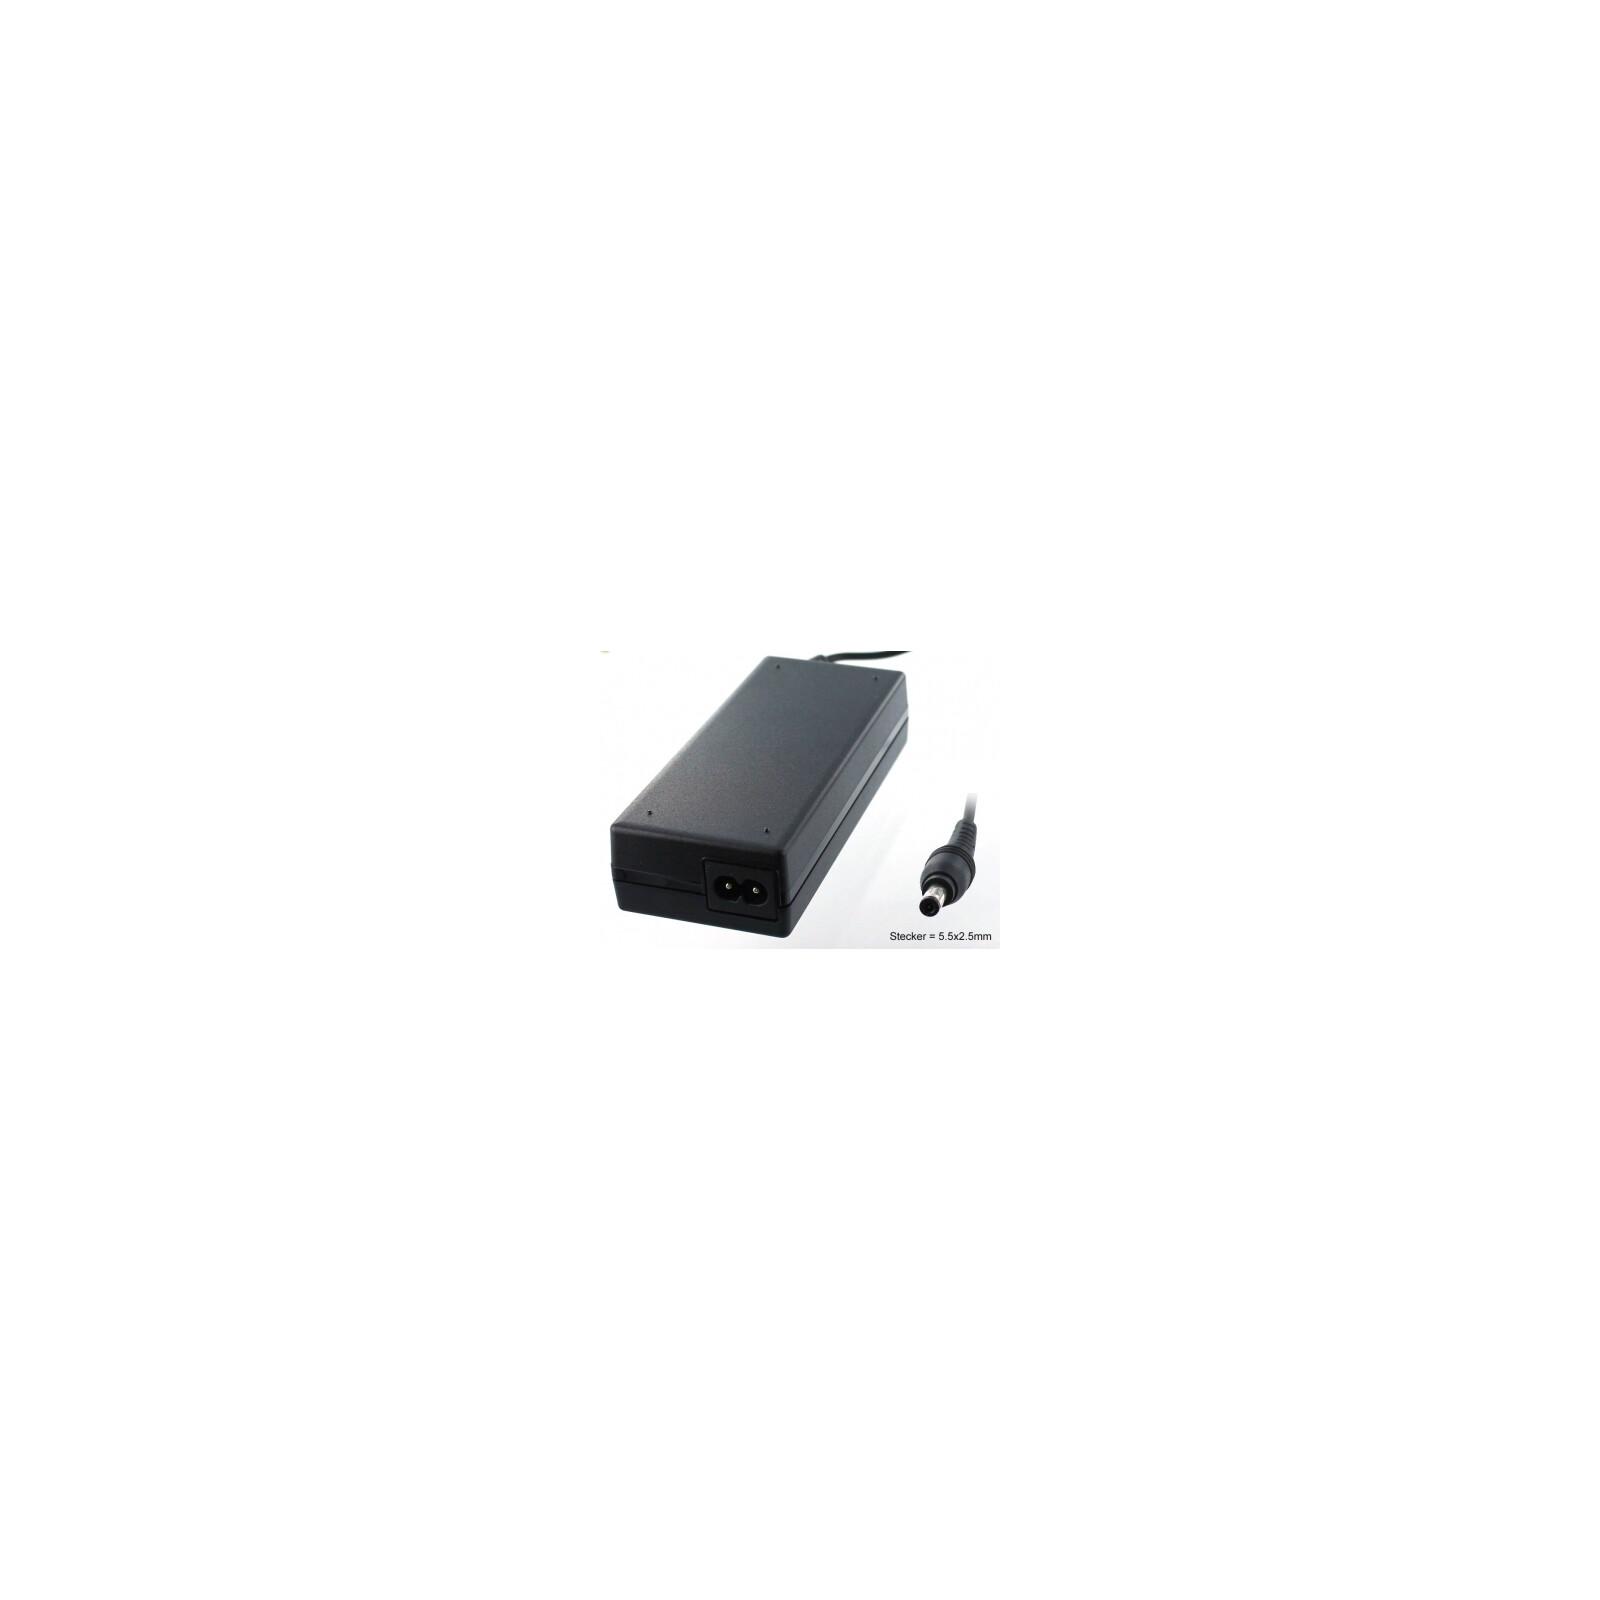 AGI Netzteil Gericom Super Webshox PER4MA 90W